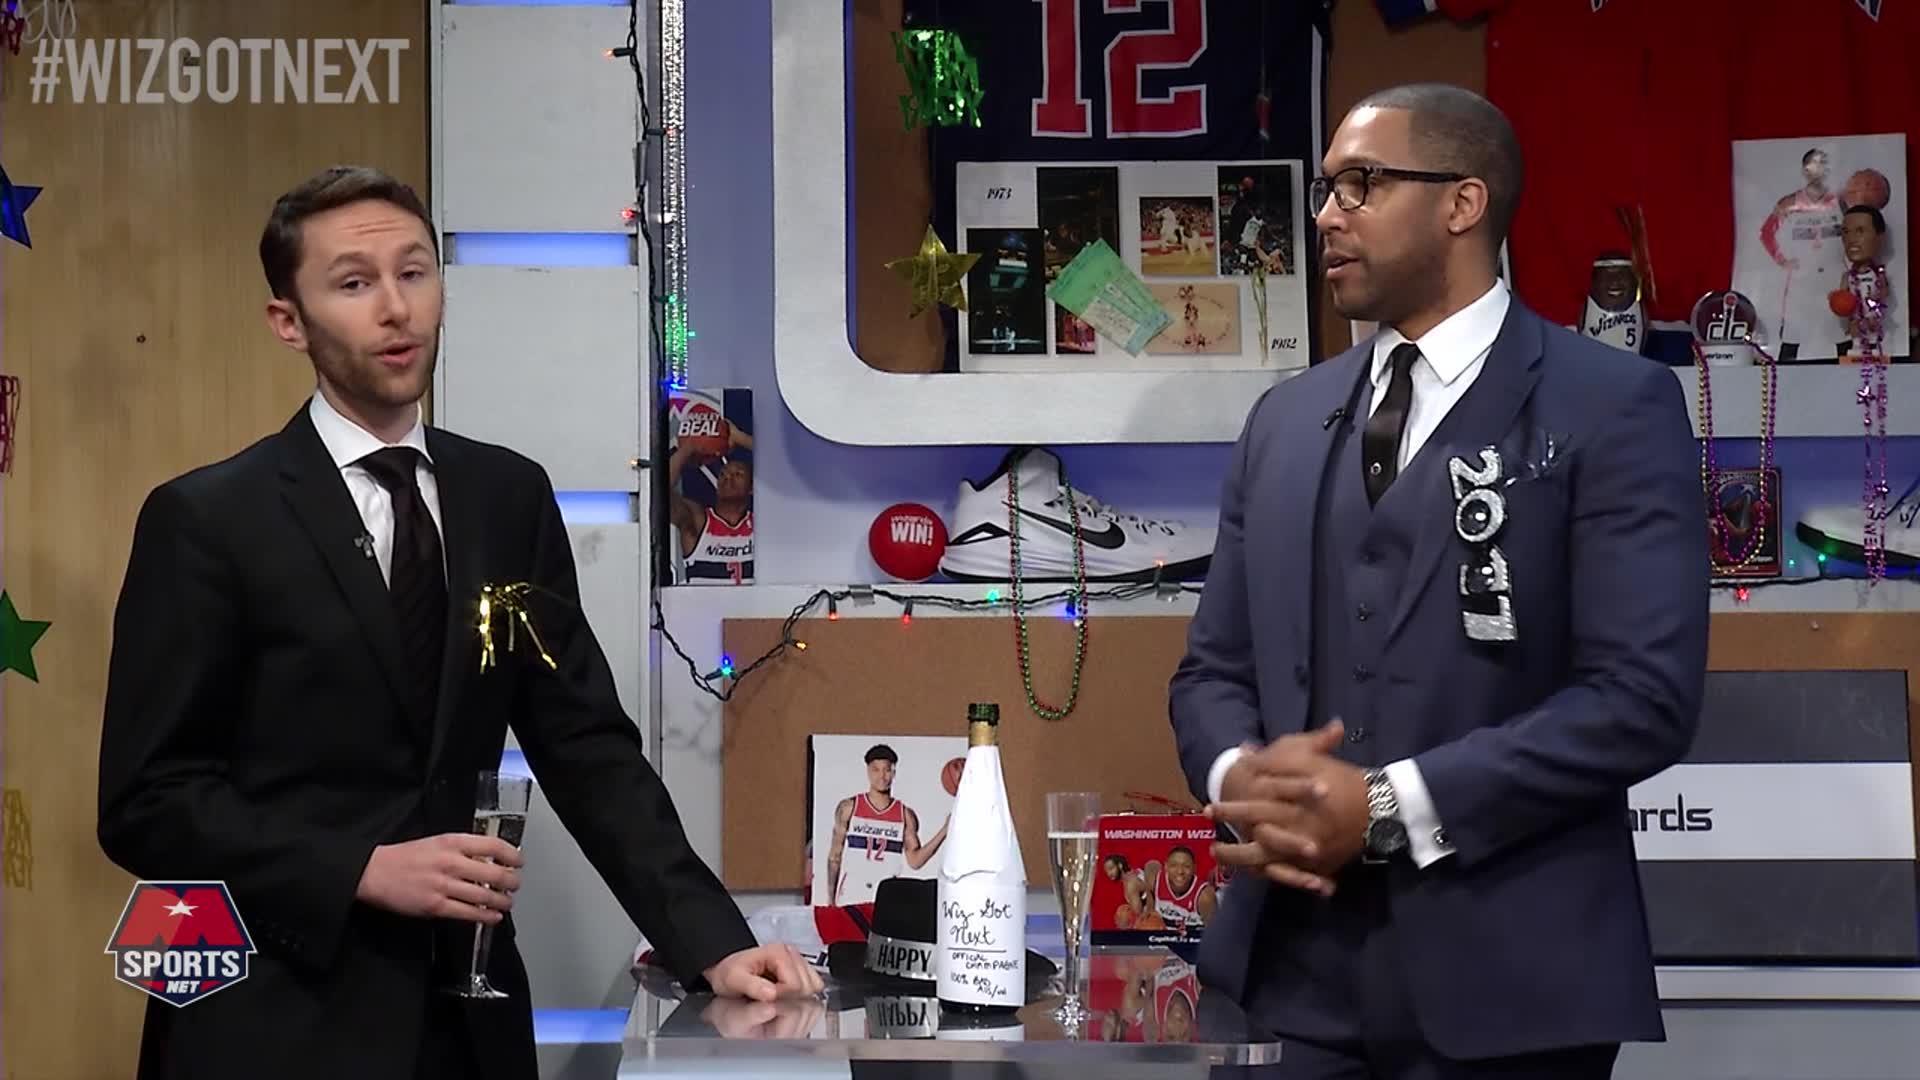 Wiz Got Next: Wizards vs Nets Pt 2 - 12-30-16